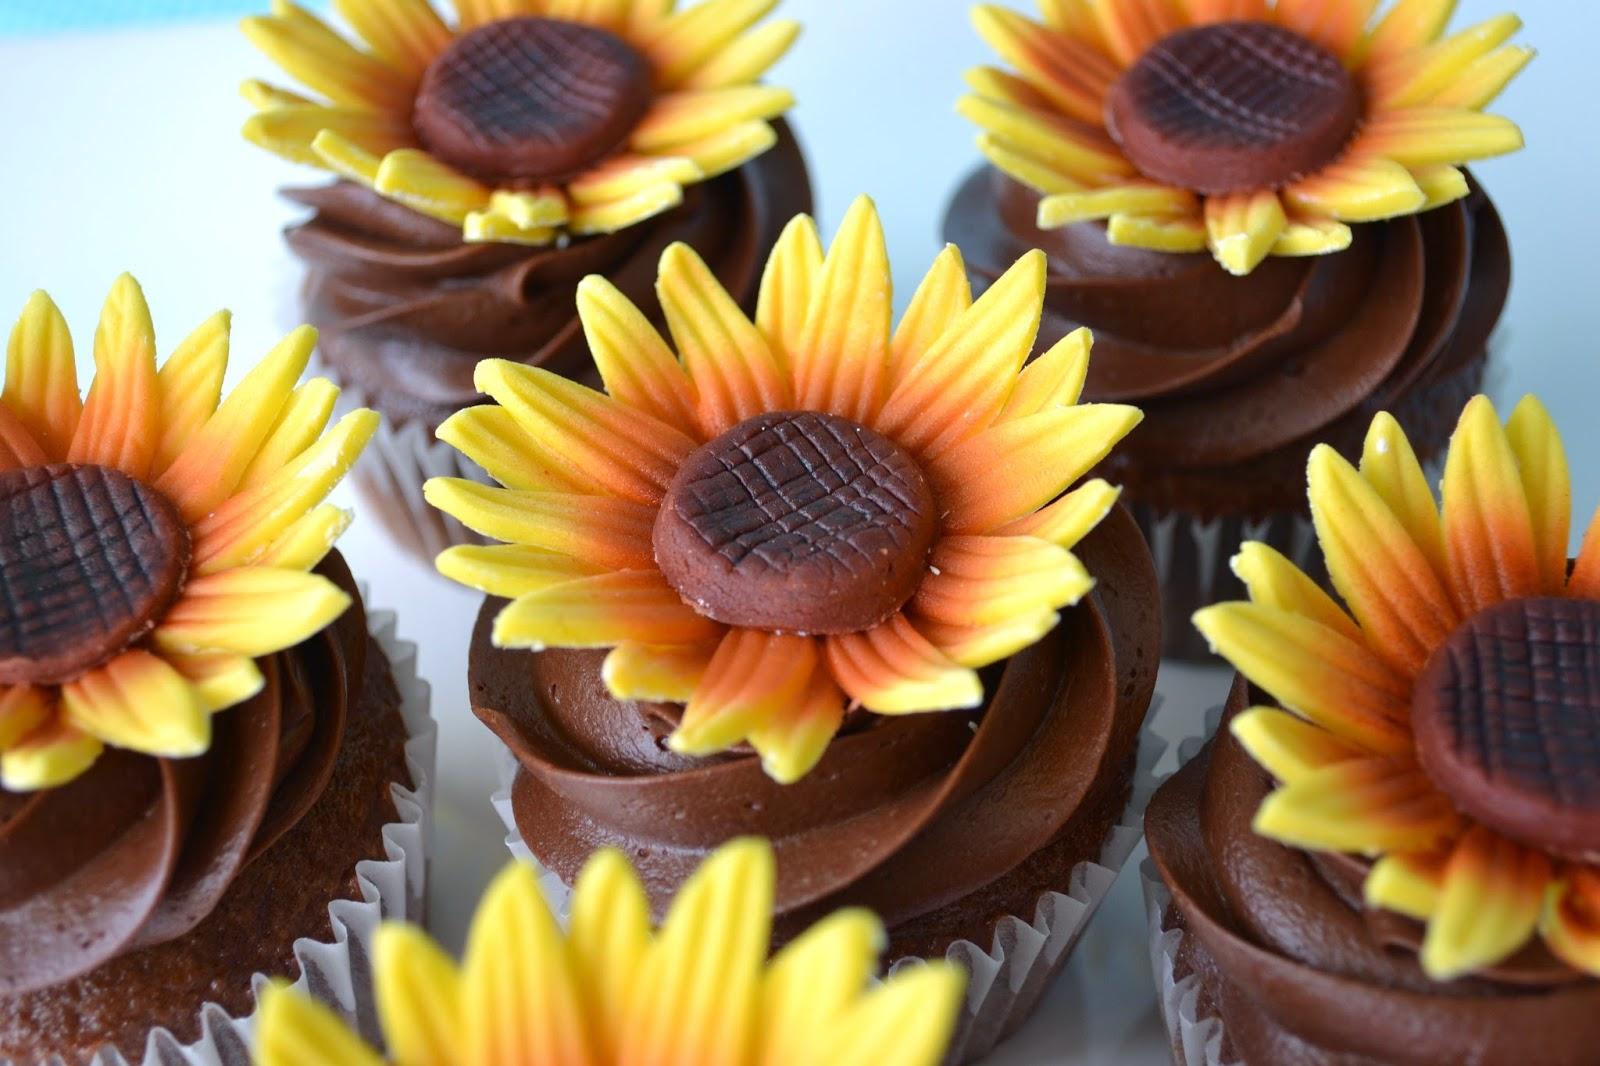 T cakes Sunflower Cupcakes